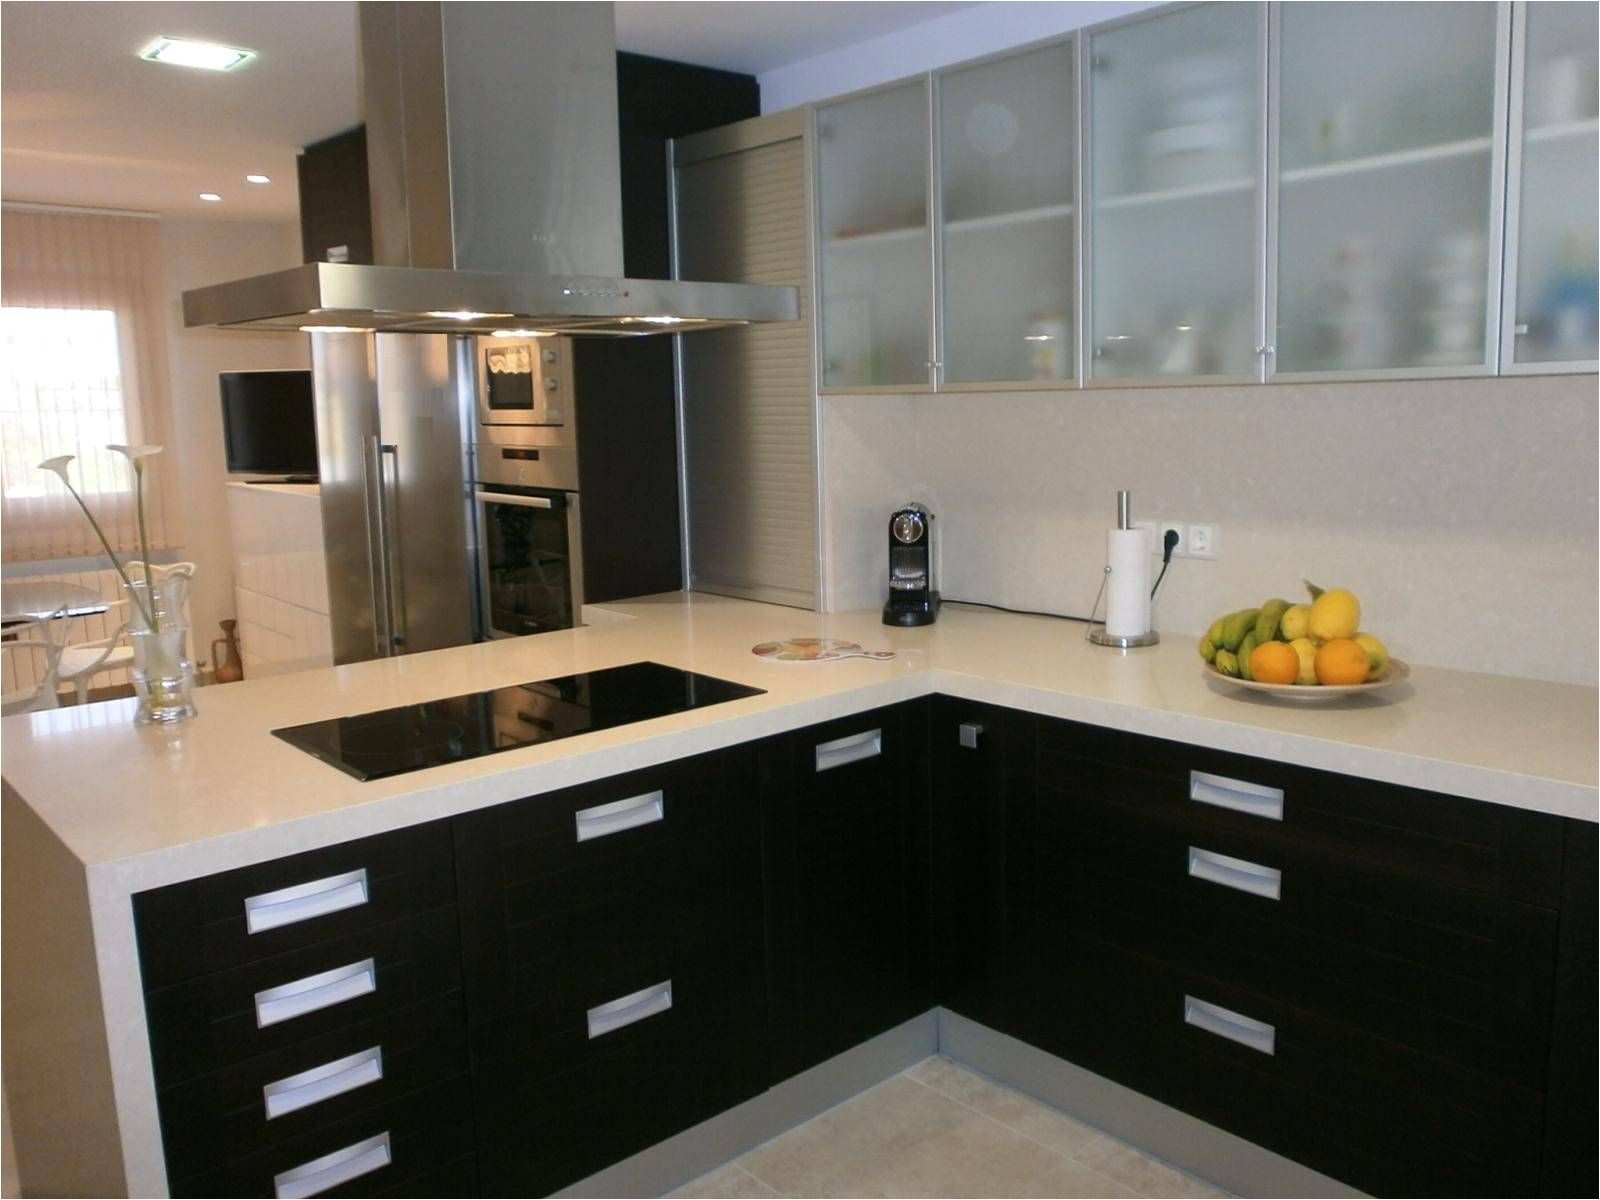 cocinas pequea as modernas impresionante fotografia imagen el derecho fotografas cocinas pequea as ikea innovadoras